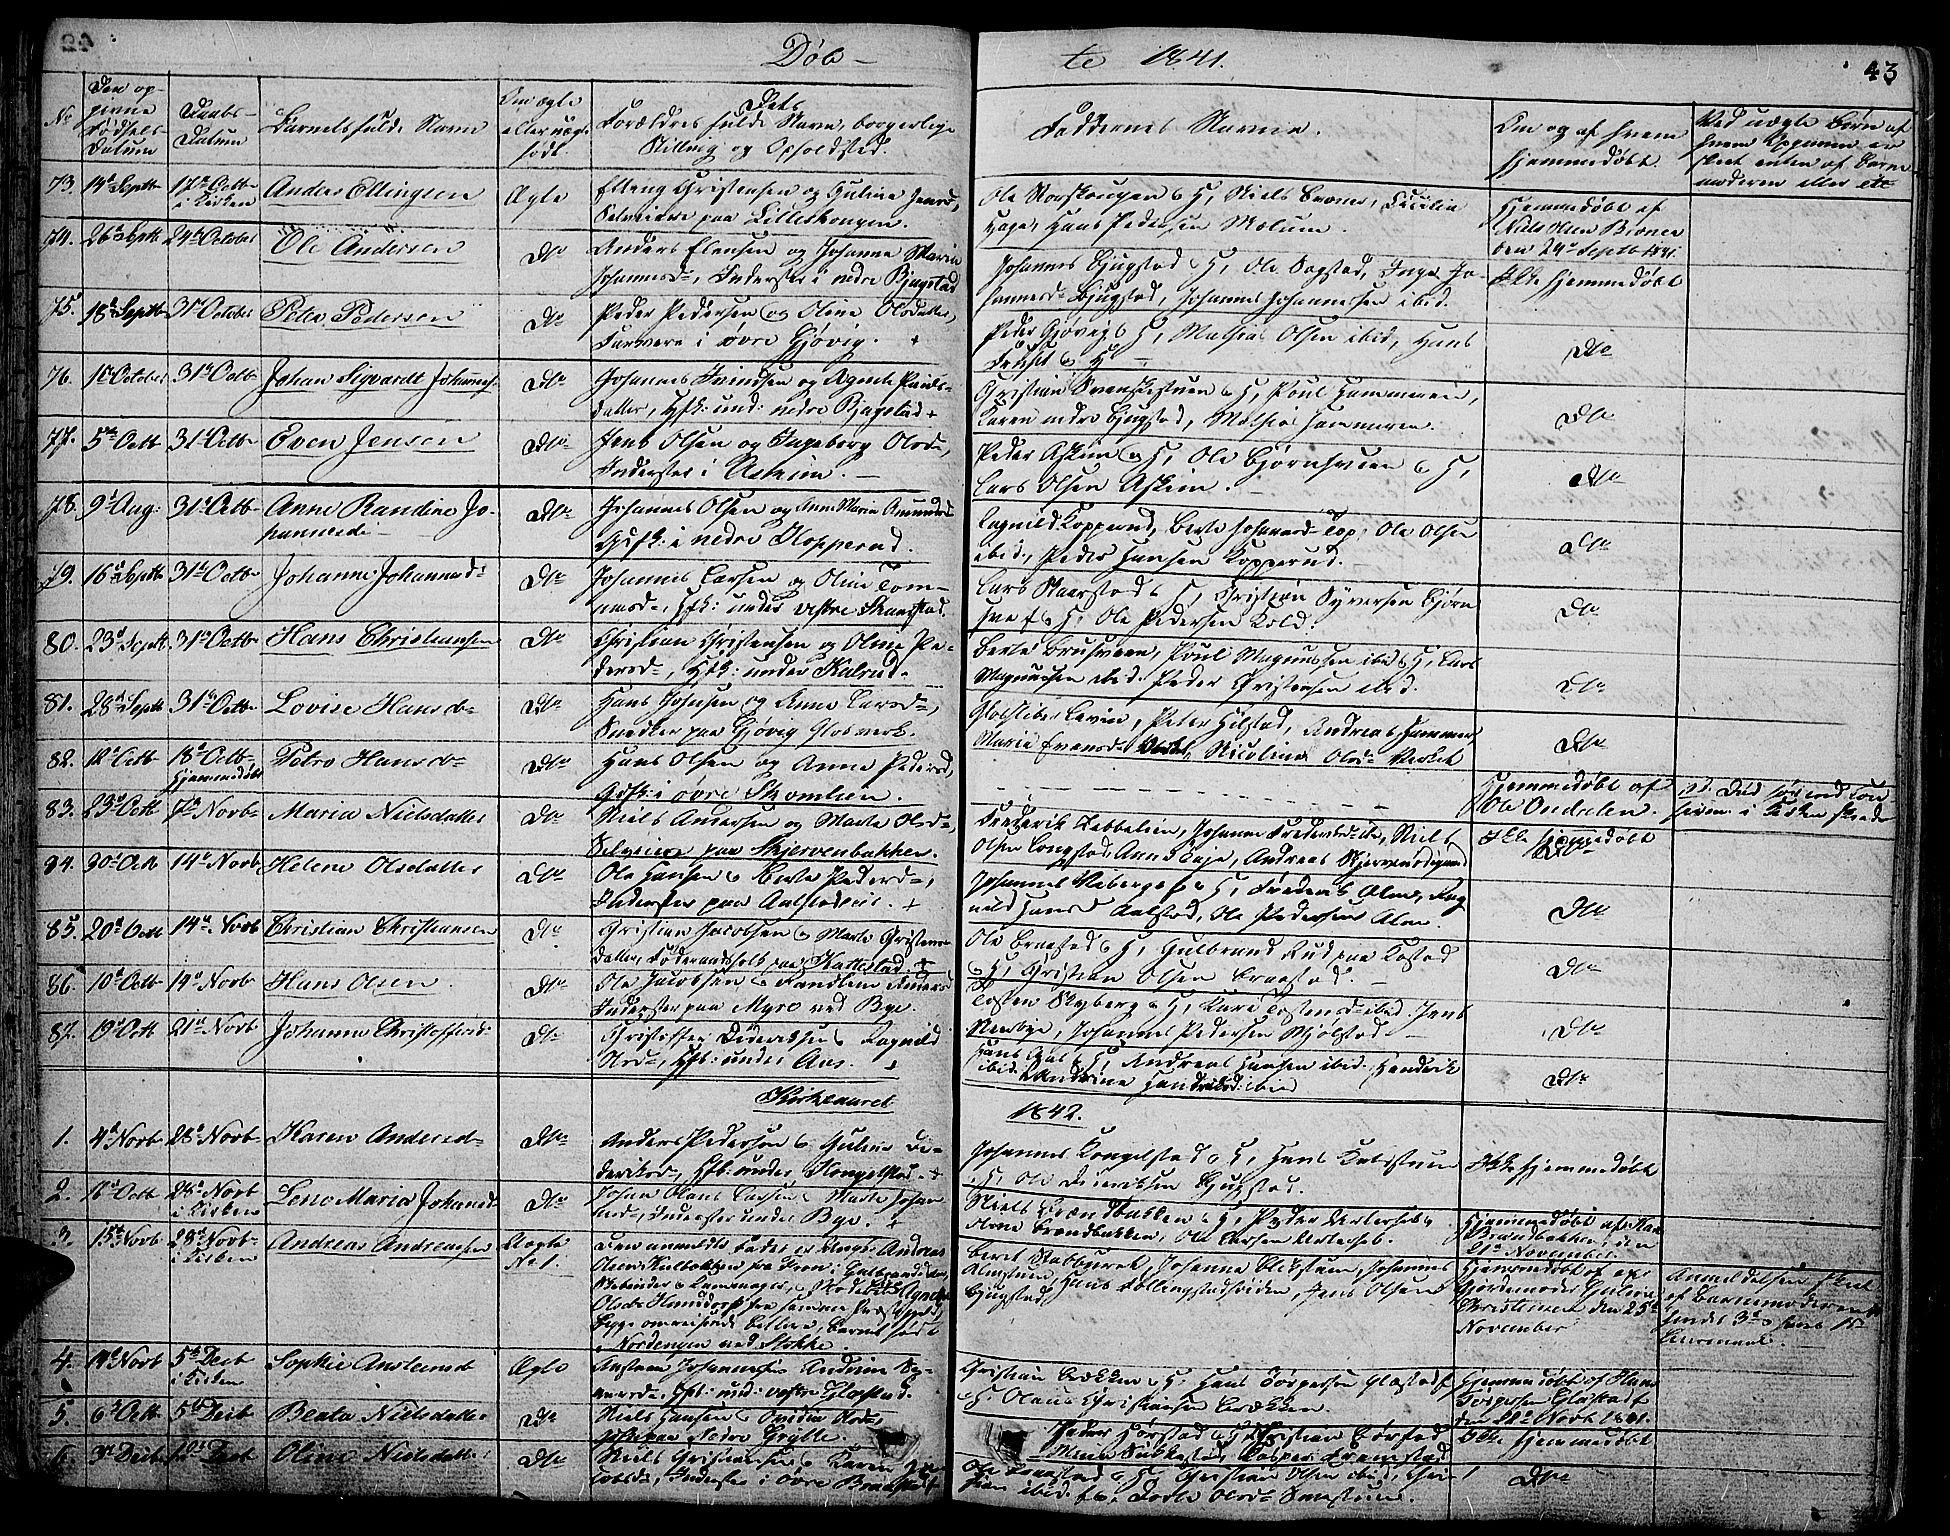 SAH, Vardal prestekontor, H/Ha/Hab/L0004: Klokkerbok nr. 4, 1831-1853, s. 43